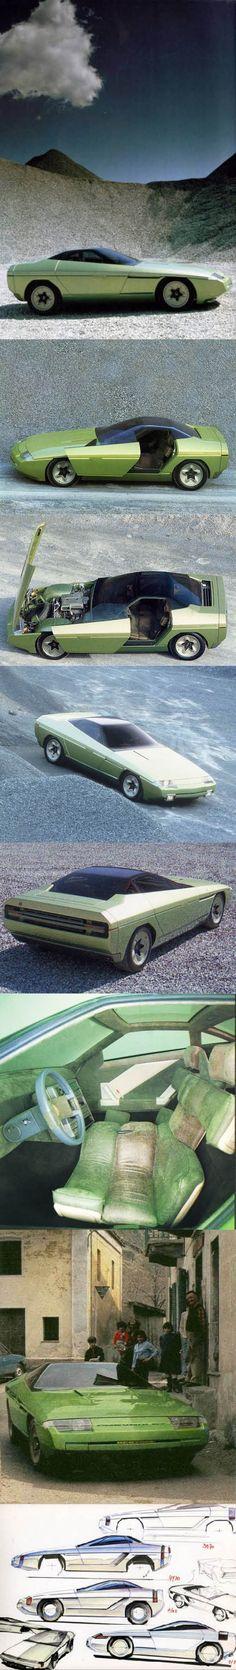 1984 Bertone Ramarro / Marc Deschamps / Chevrolet Corvette / Belgium / Italy / concept / green / 17-24